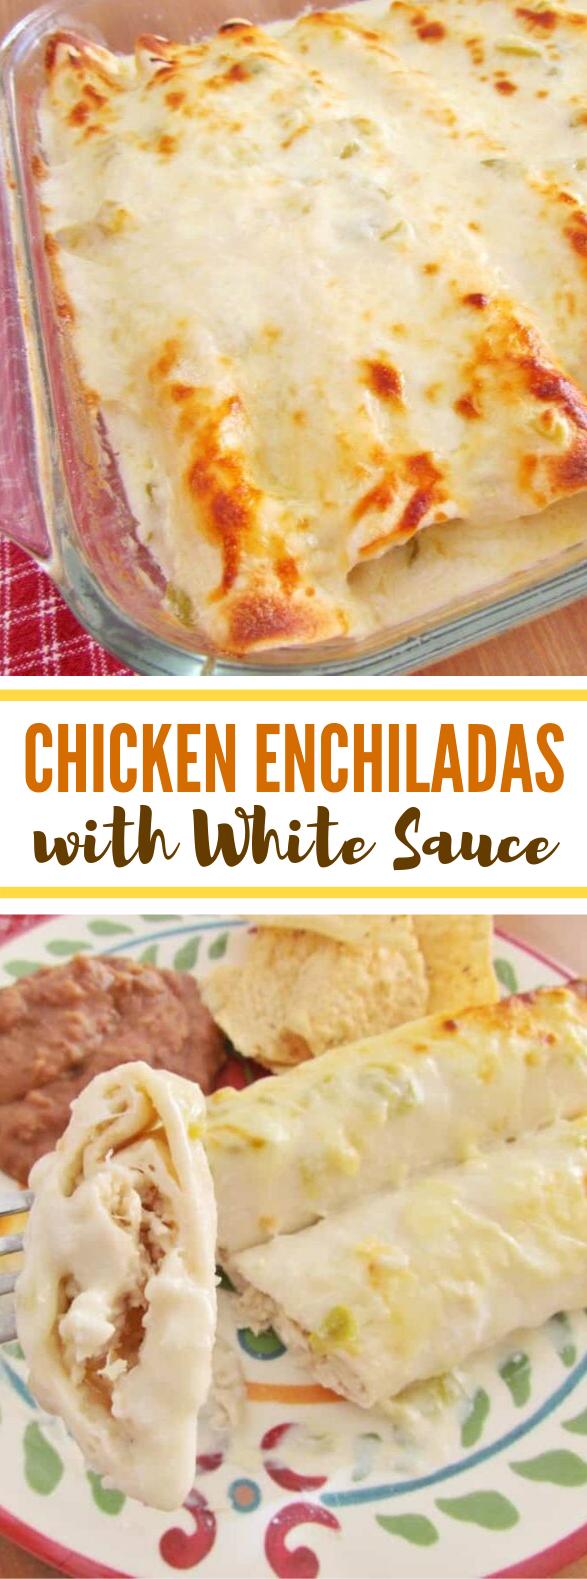 EASY CREAMY WHITE CHICKEN ENCHILADAS #dinner #mozzarella